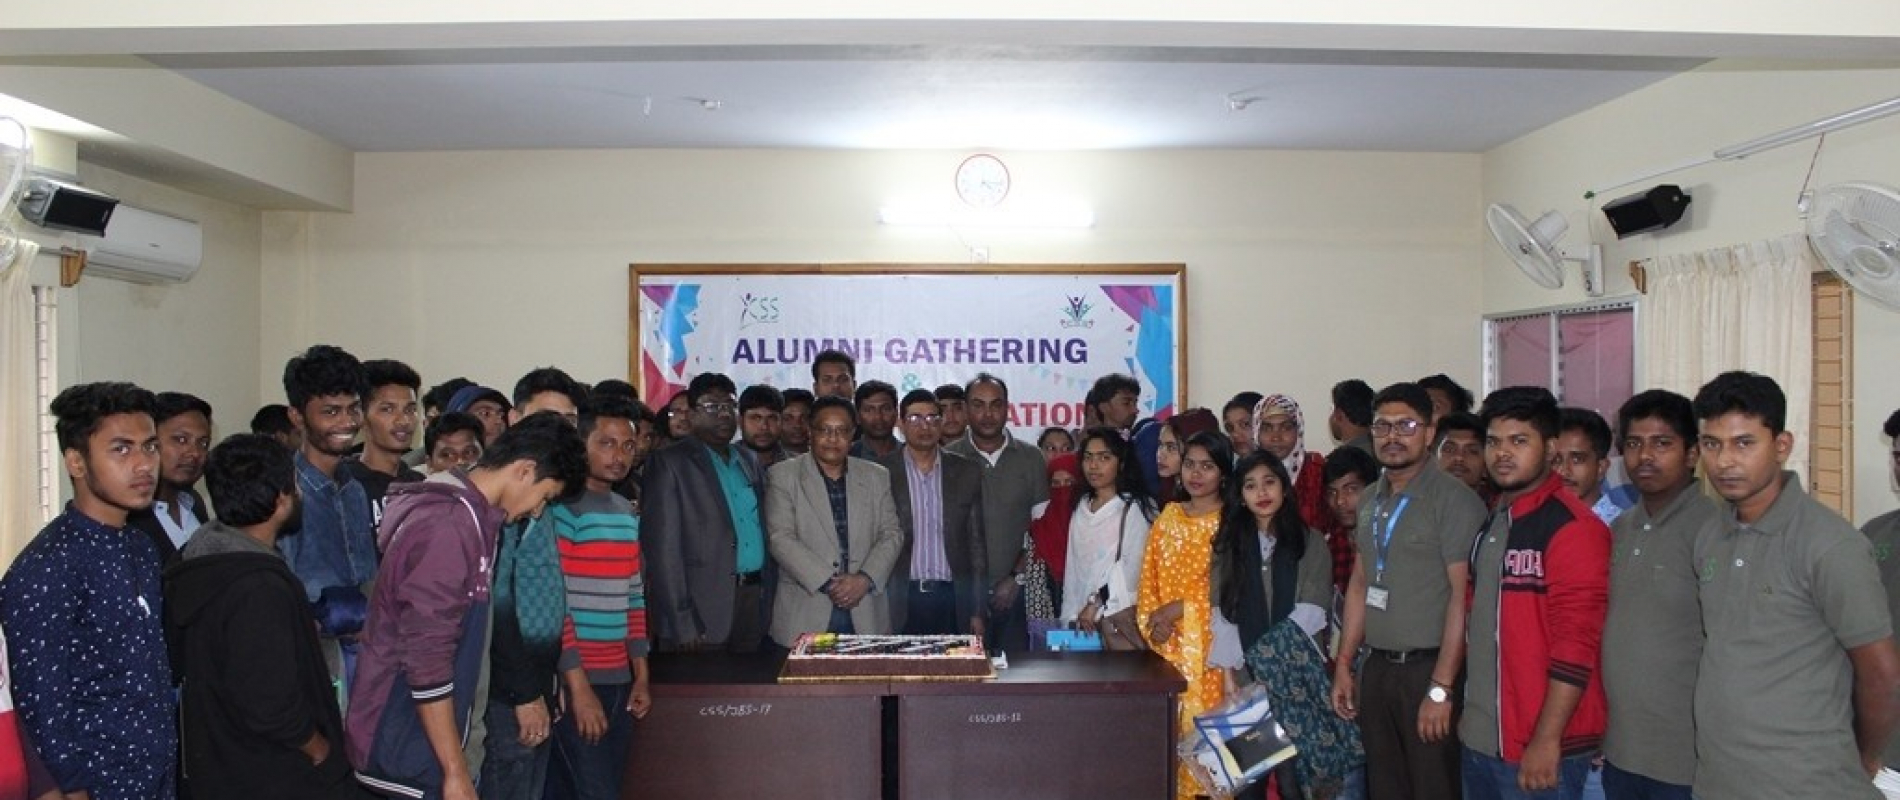 Alumni gathering & jbs day celebration 2019